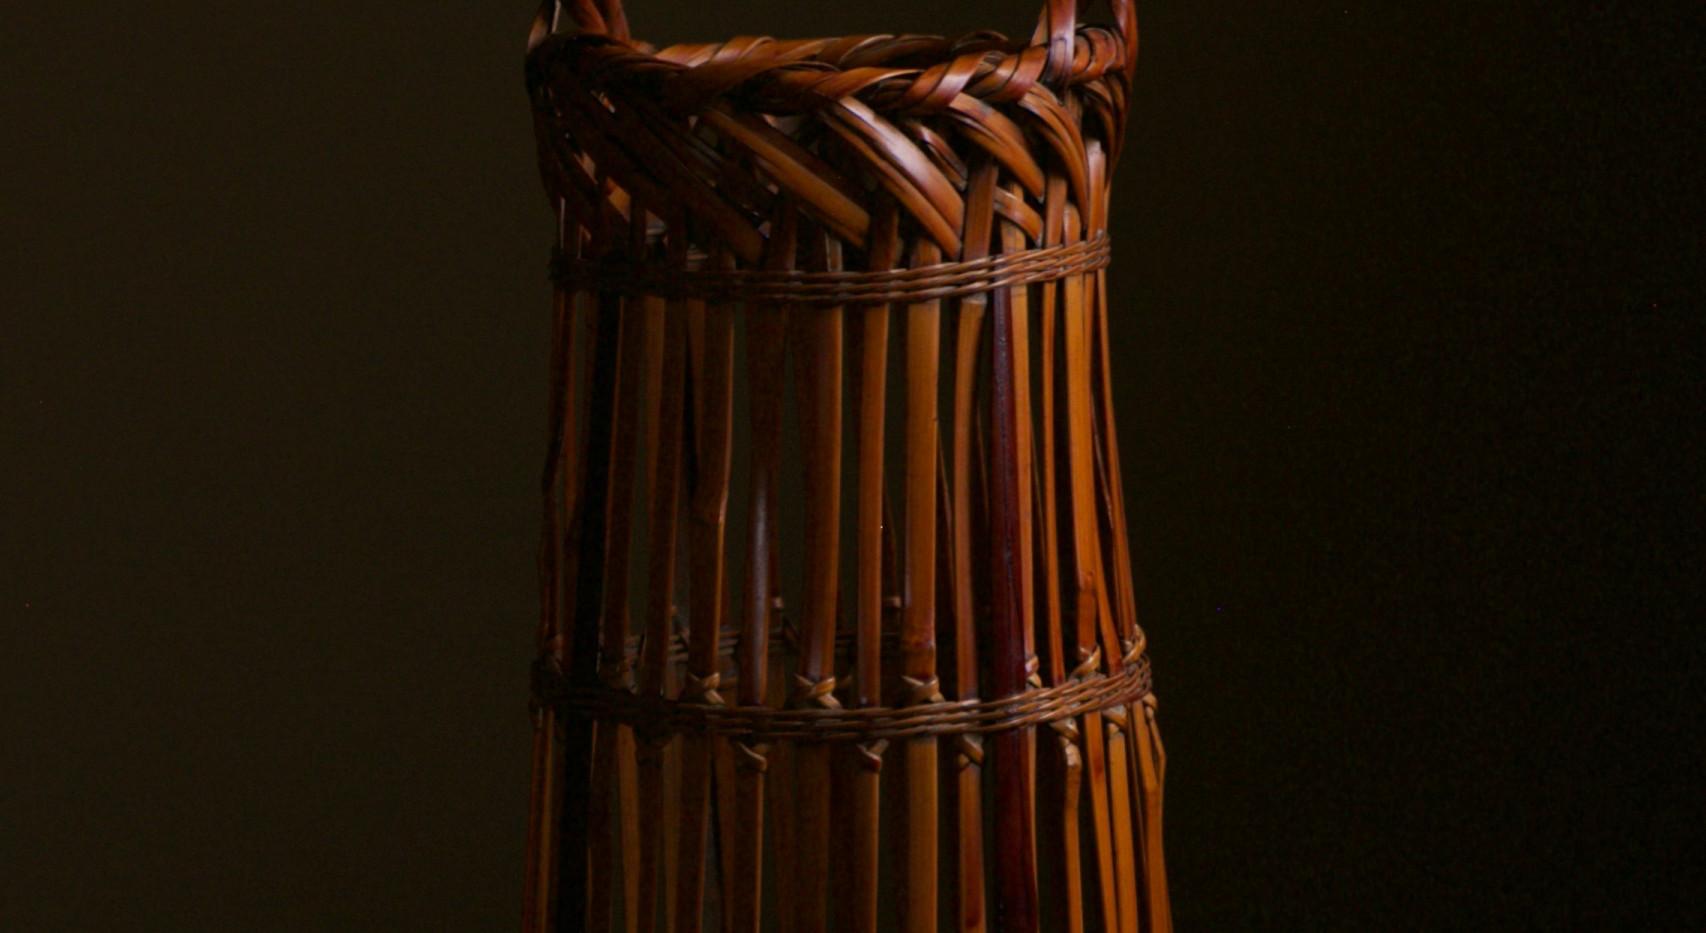 Tanabe Chikuunsai II Bamboo Fence 01.jpg